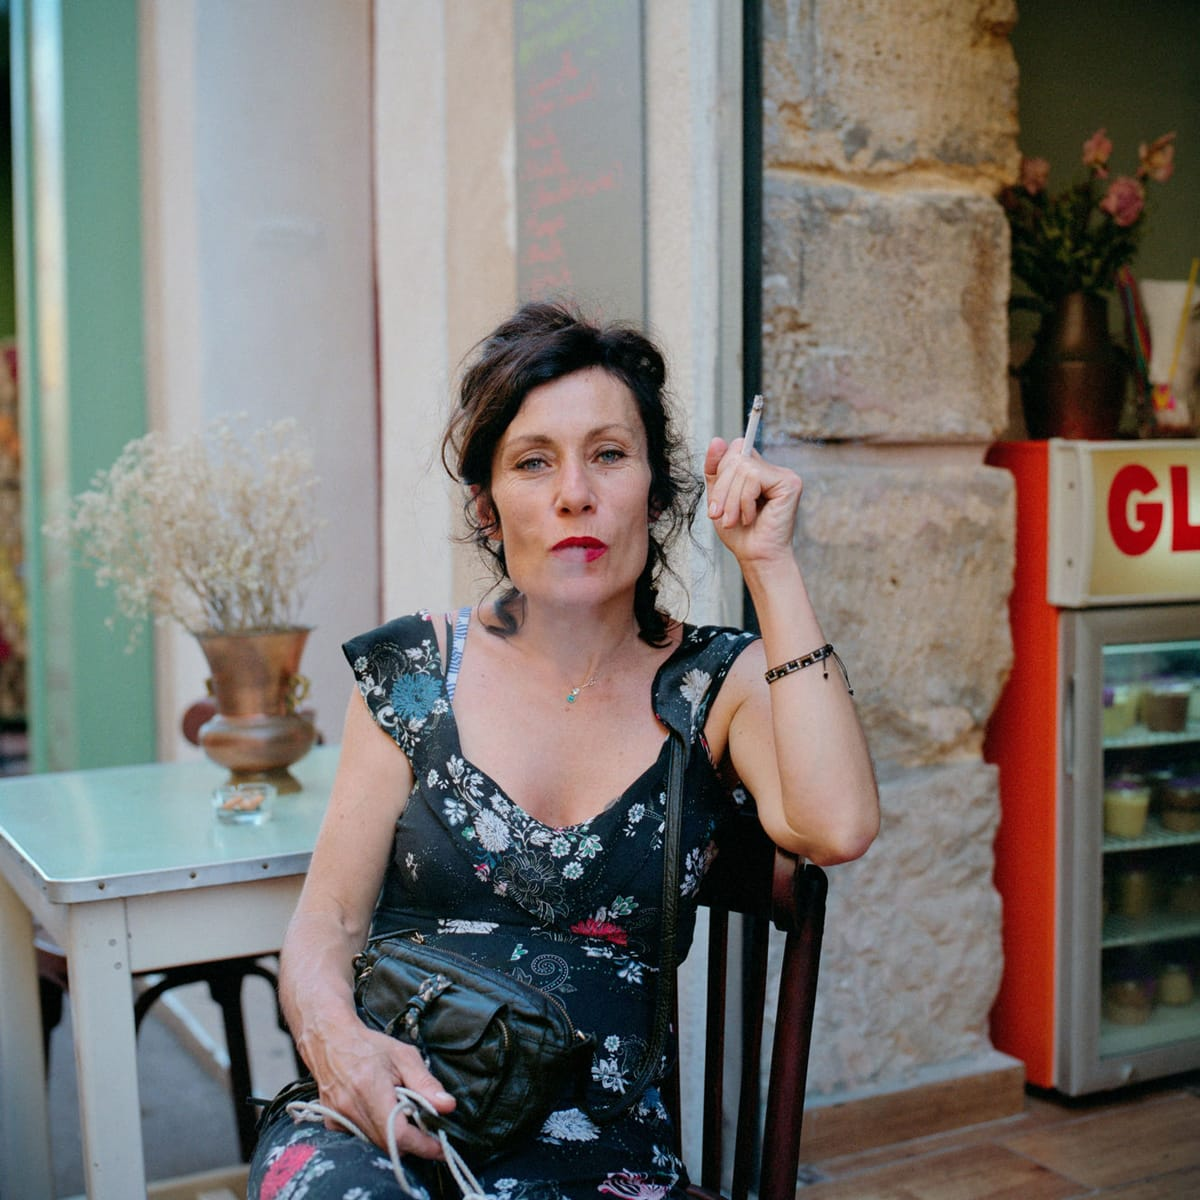 Elise Llinares - Littoral Marseille